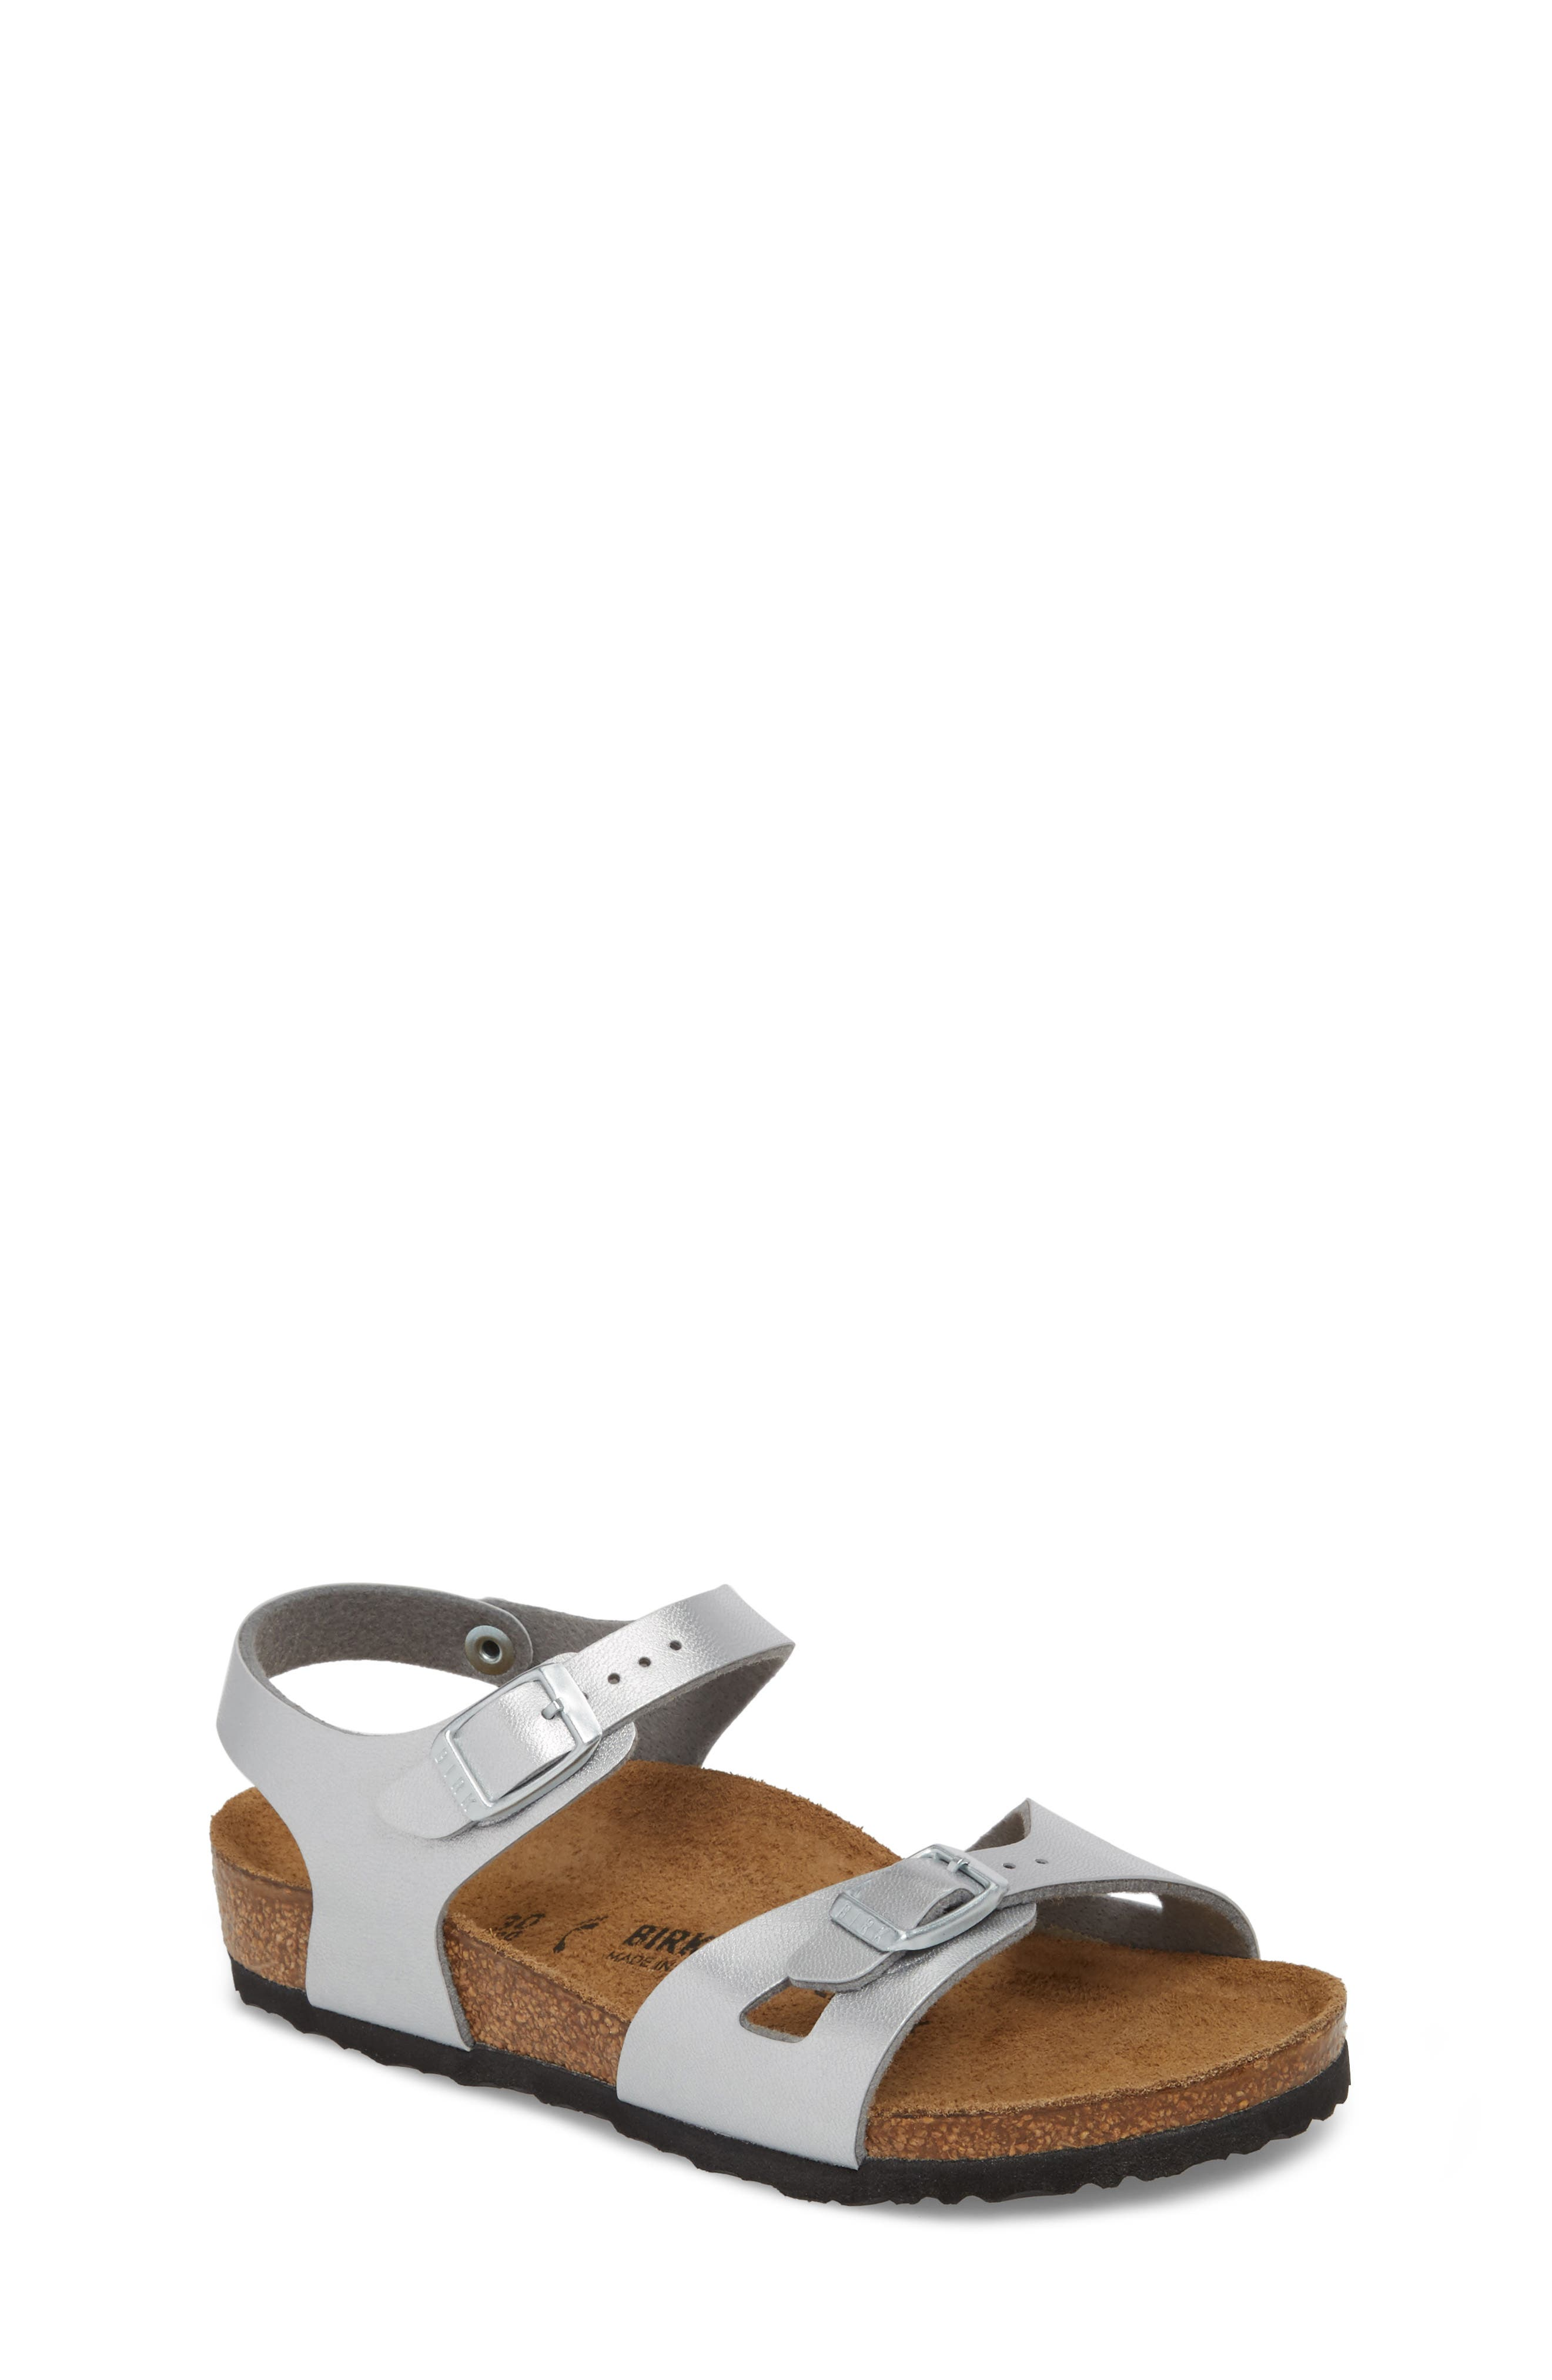 Rio Metallic Sandal,                             Main thumbnail 1, color,                             Silver